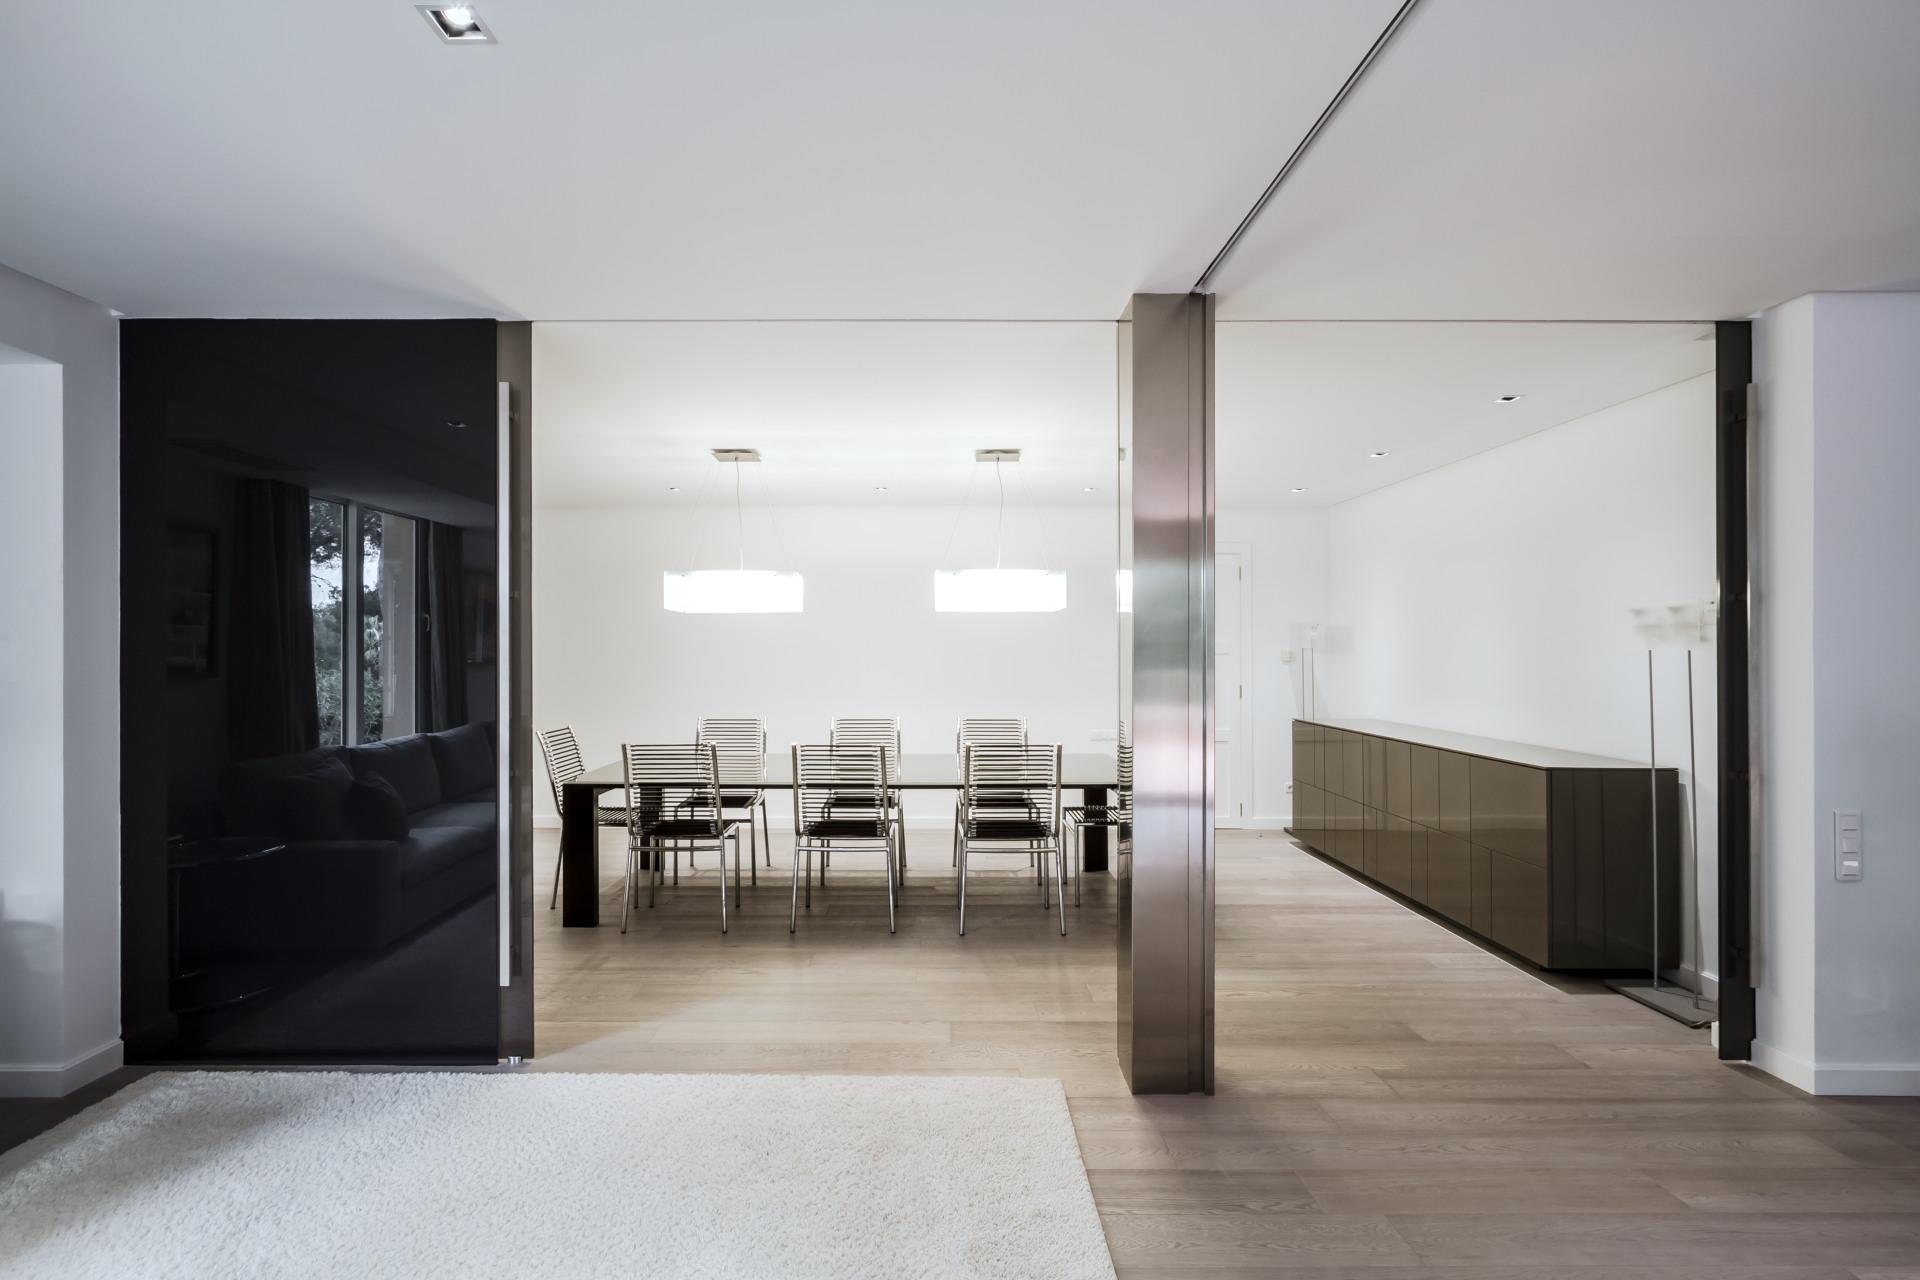 fotografia-arquitectura-valencia-german-cabo-hernandez-barbara (10)